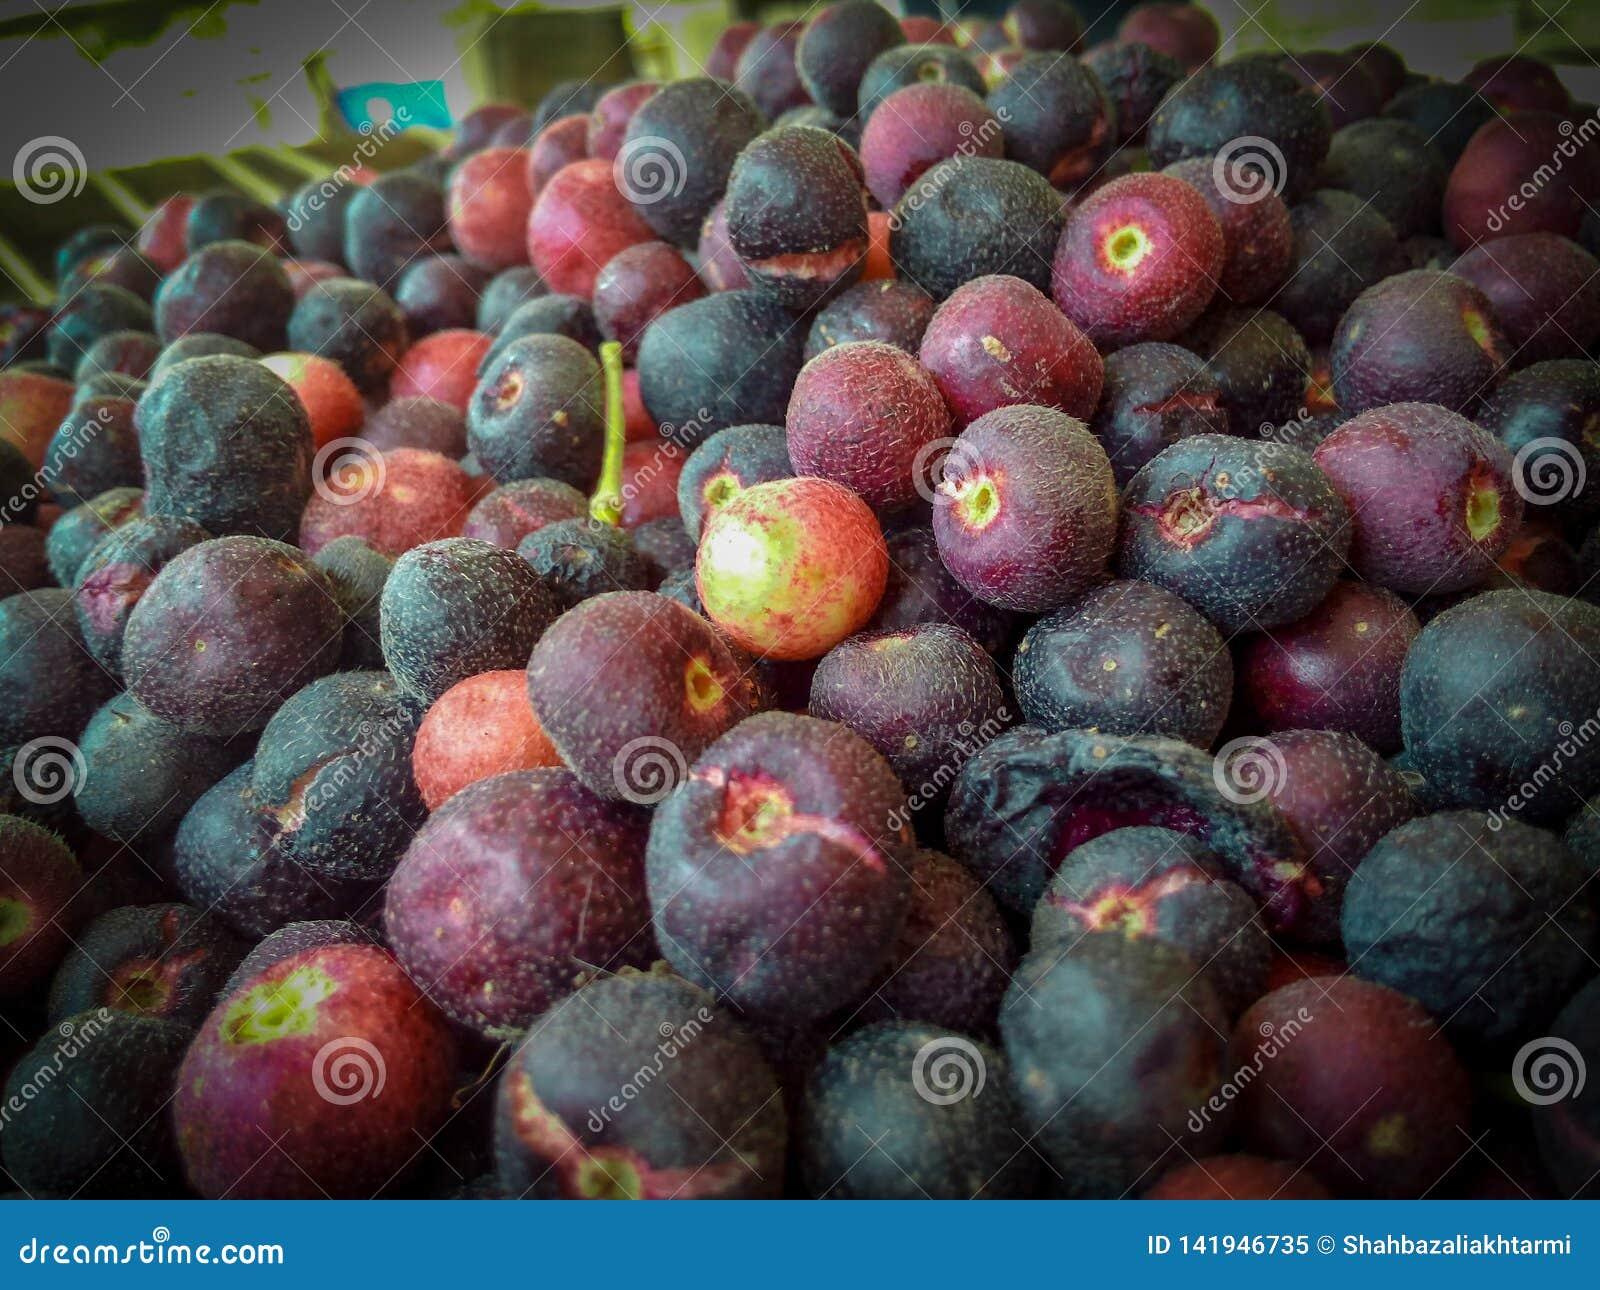 Faalsha un type de baie fruits, seerat et fruit aigre de goût